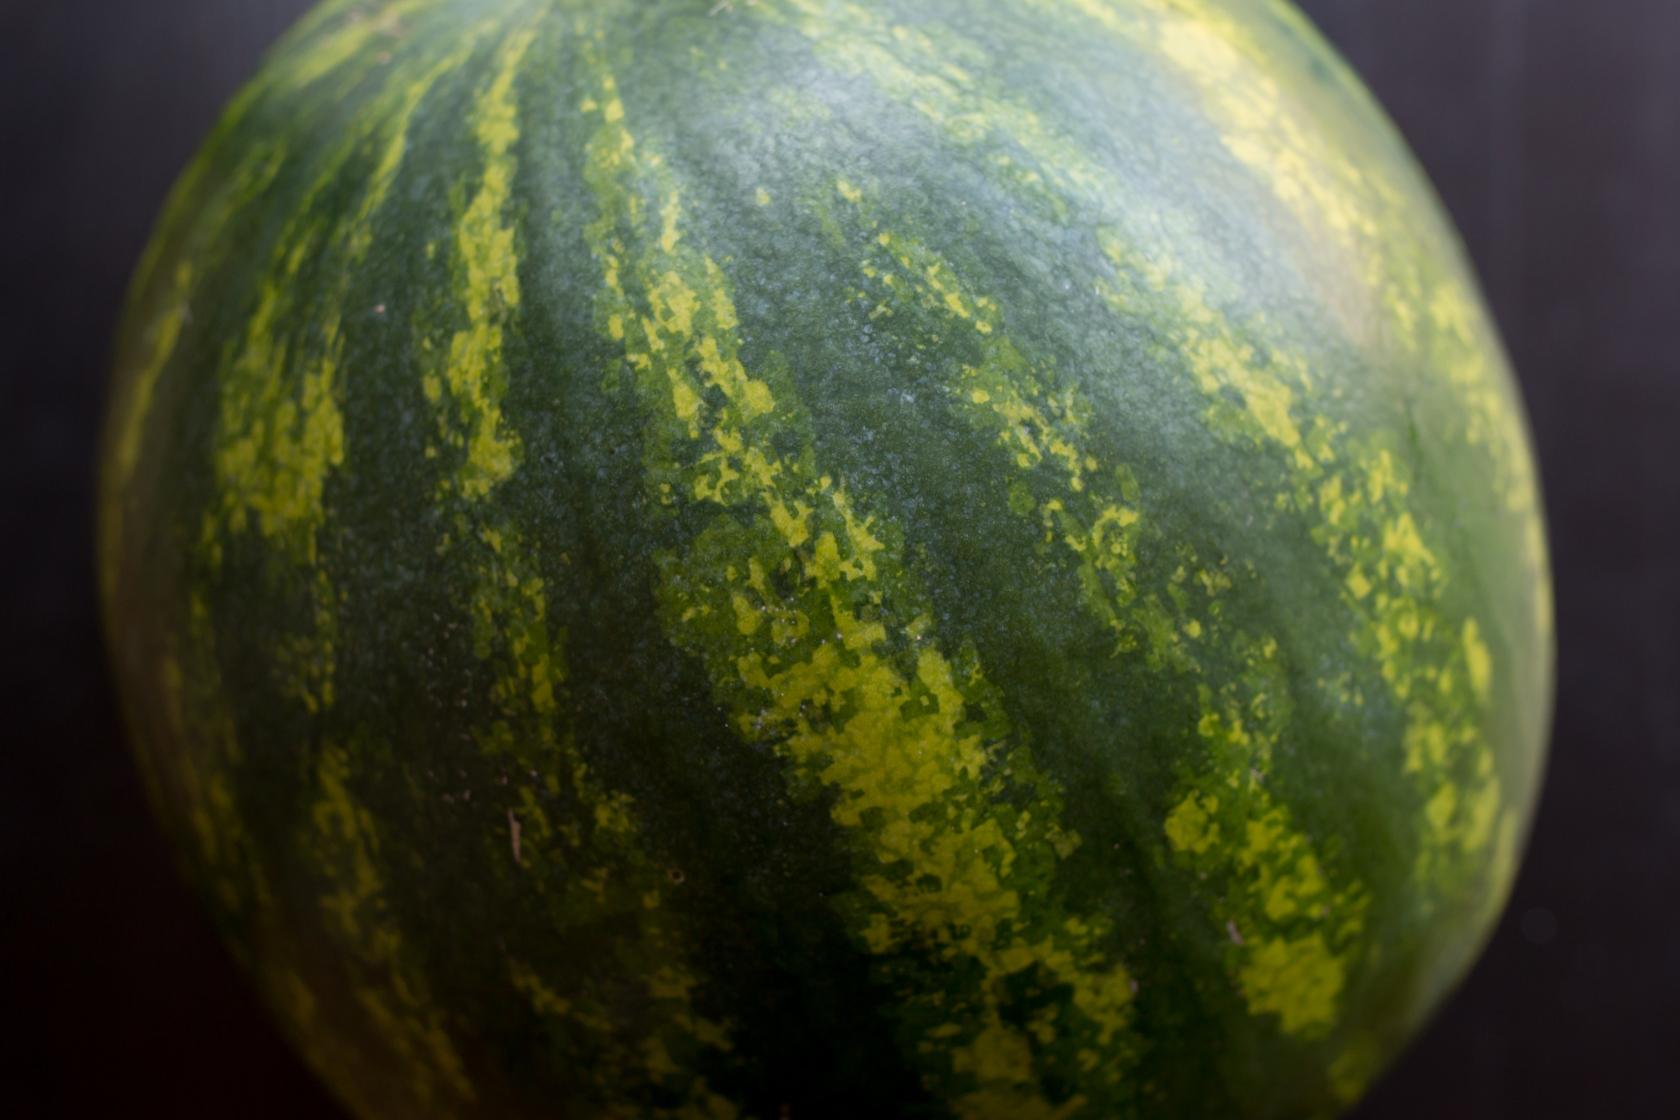 melon-15.jpg